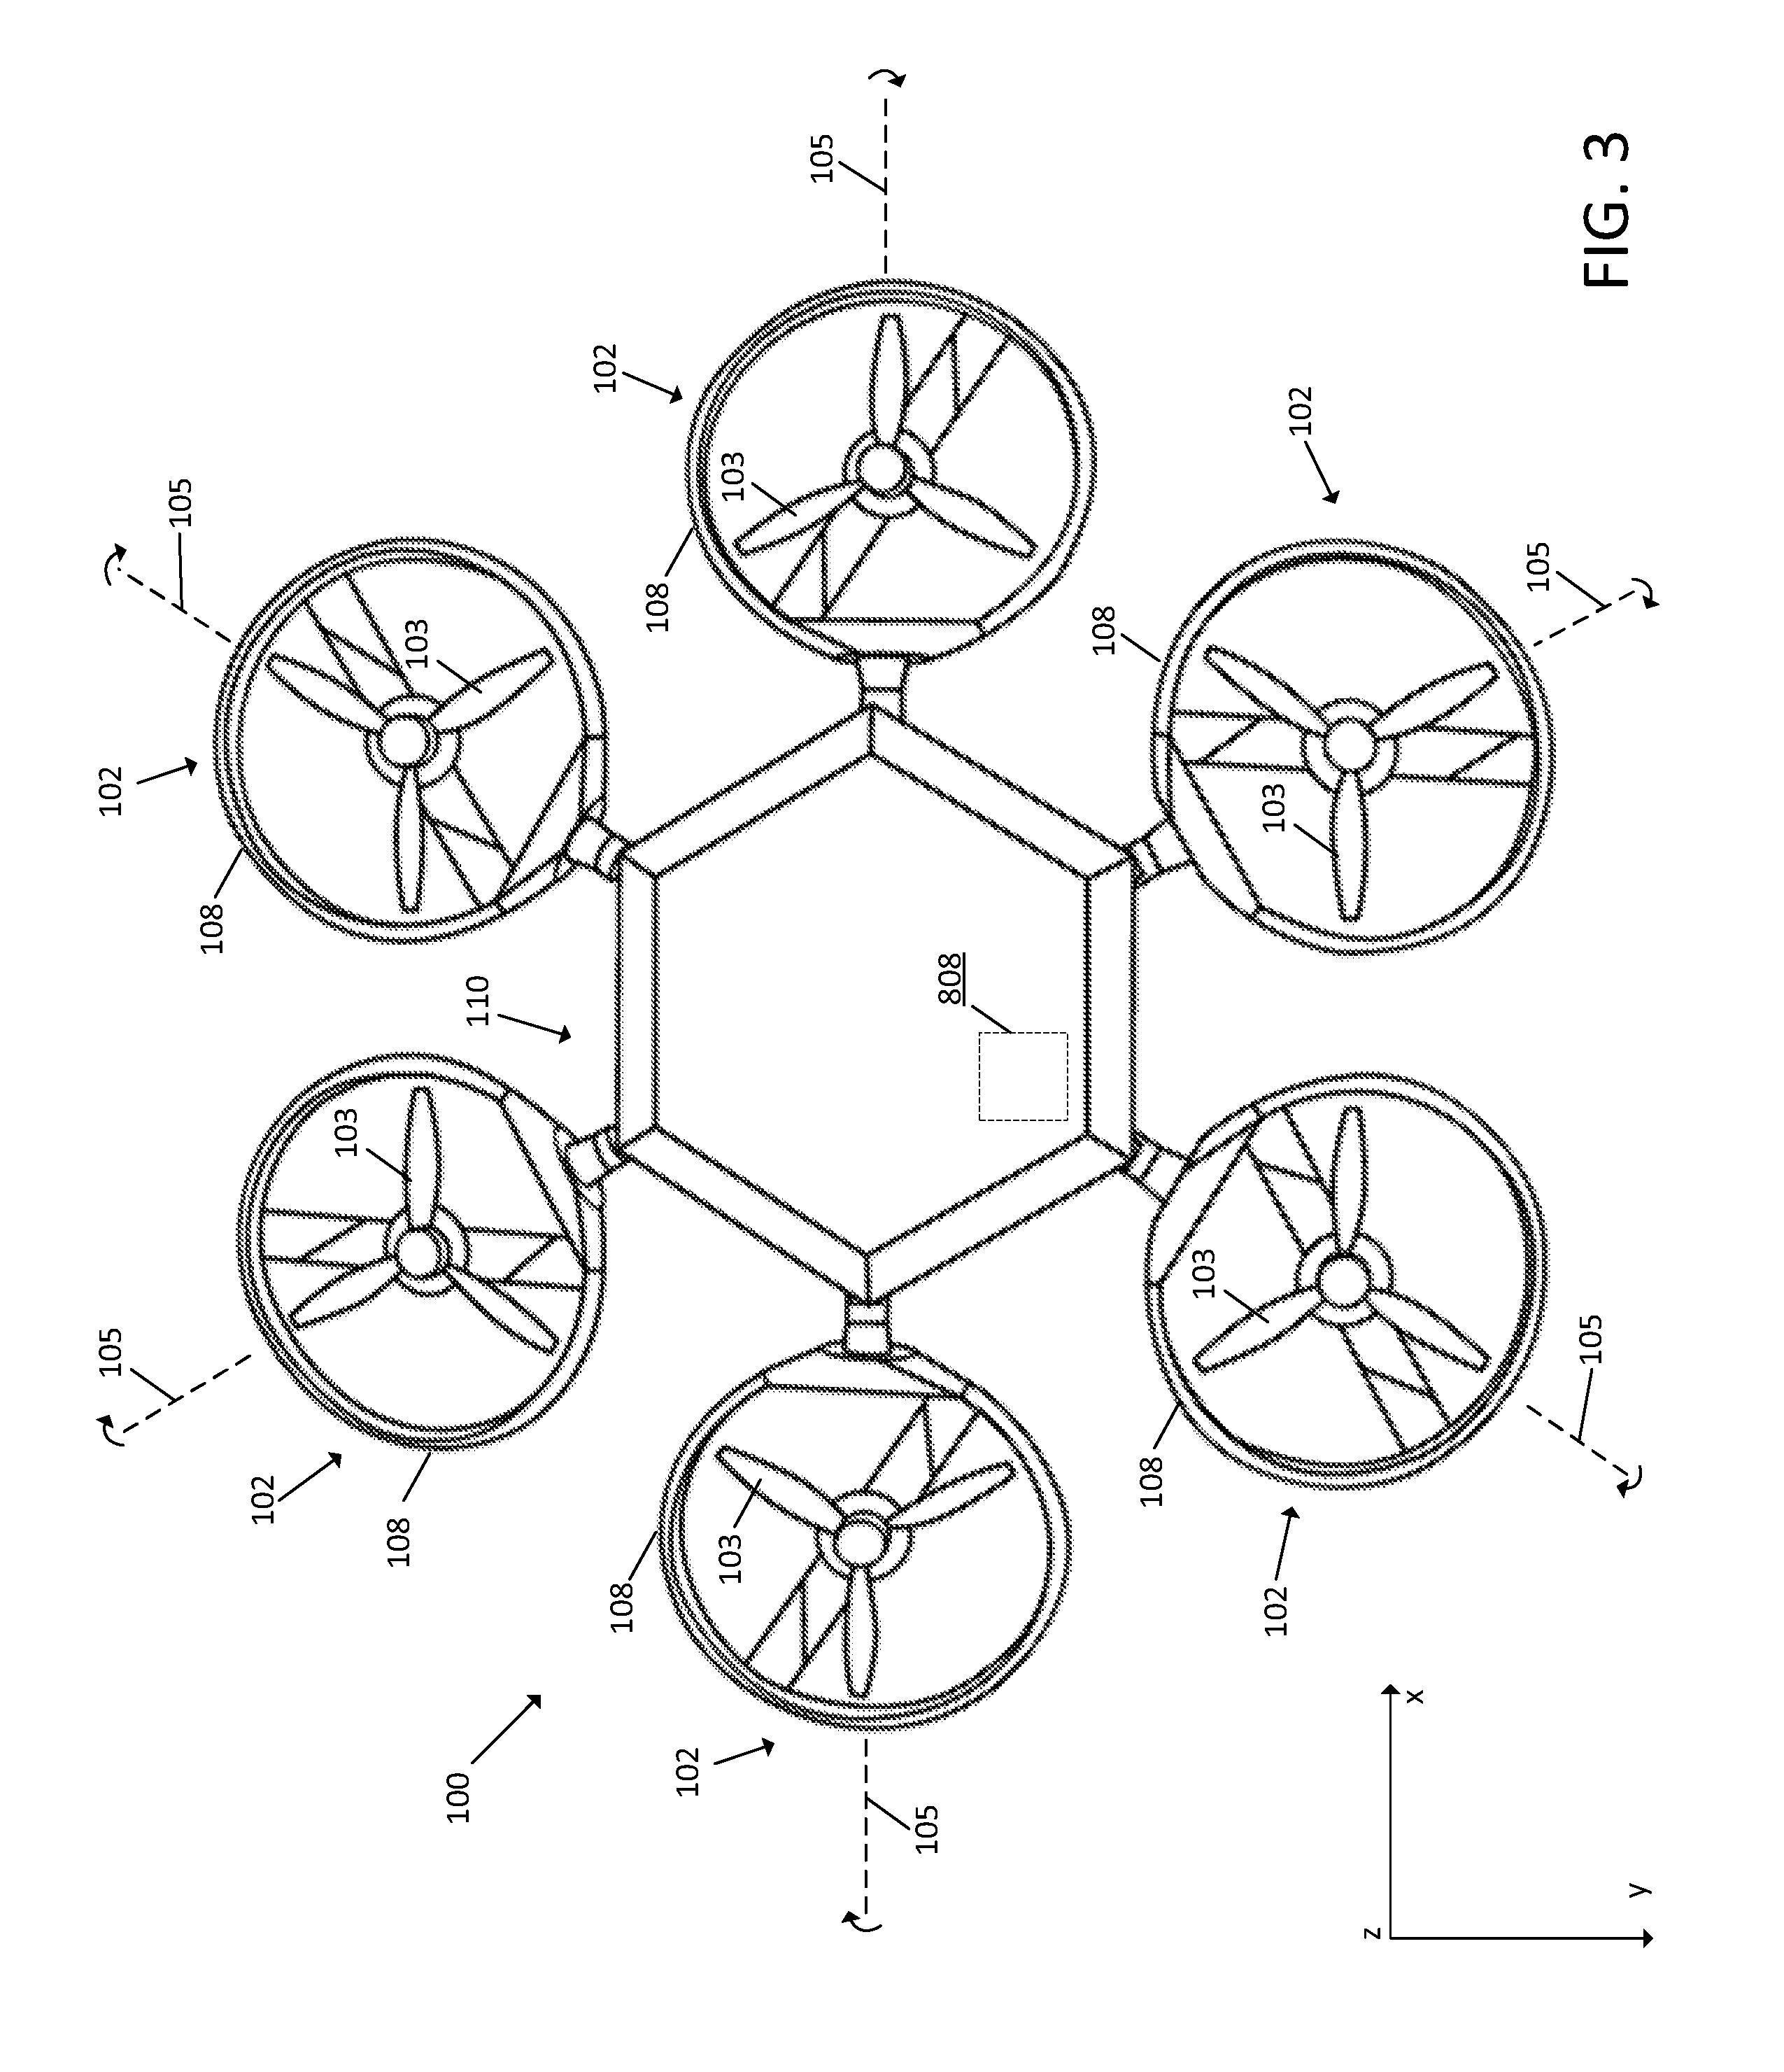 eclipse motor mount diagram wiring diagram databasepatent us 9 981 745 b2 honda accord motor mount diagram eclipse motor mount diagram